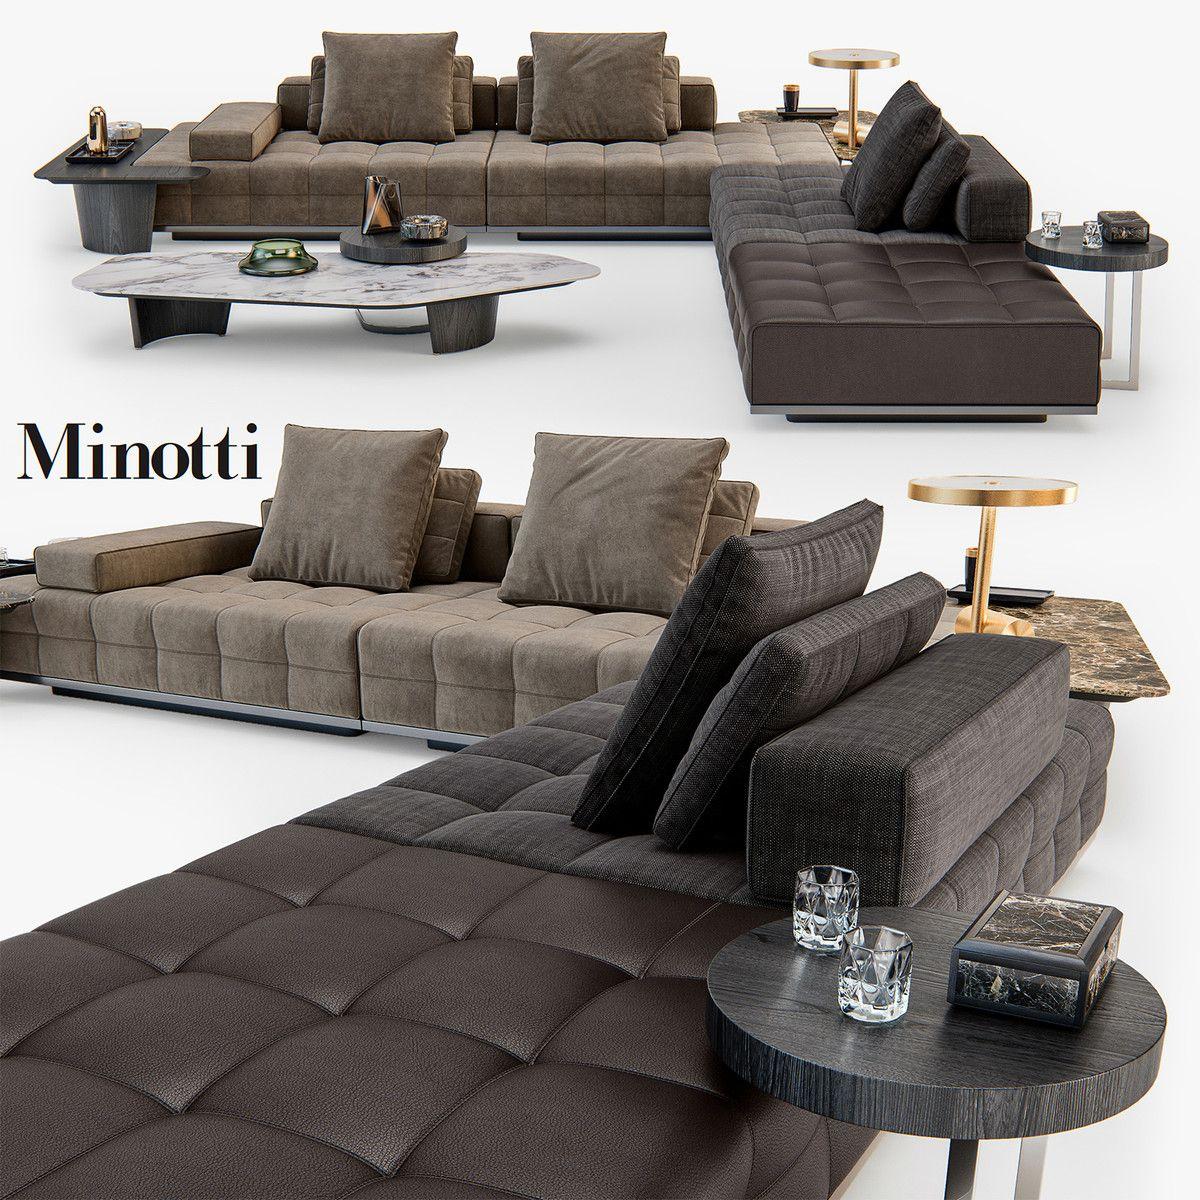 Minotti Lawrence Clan Seating Model